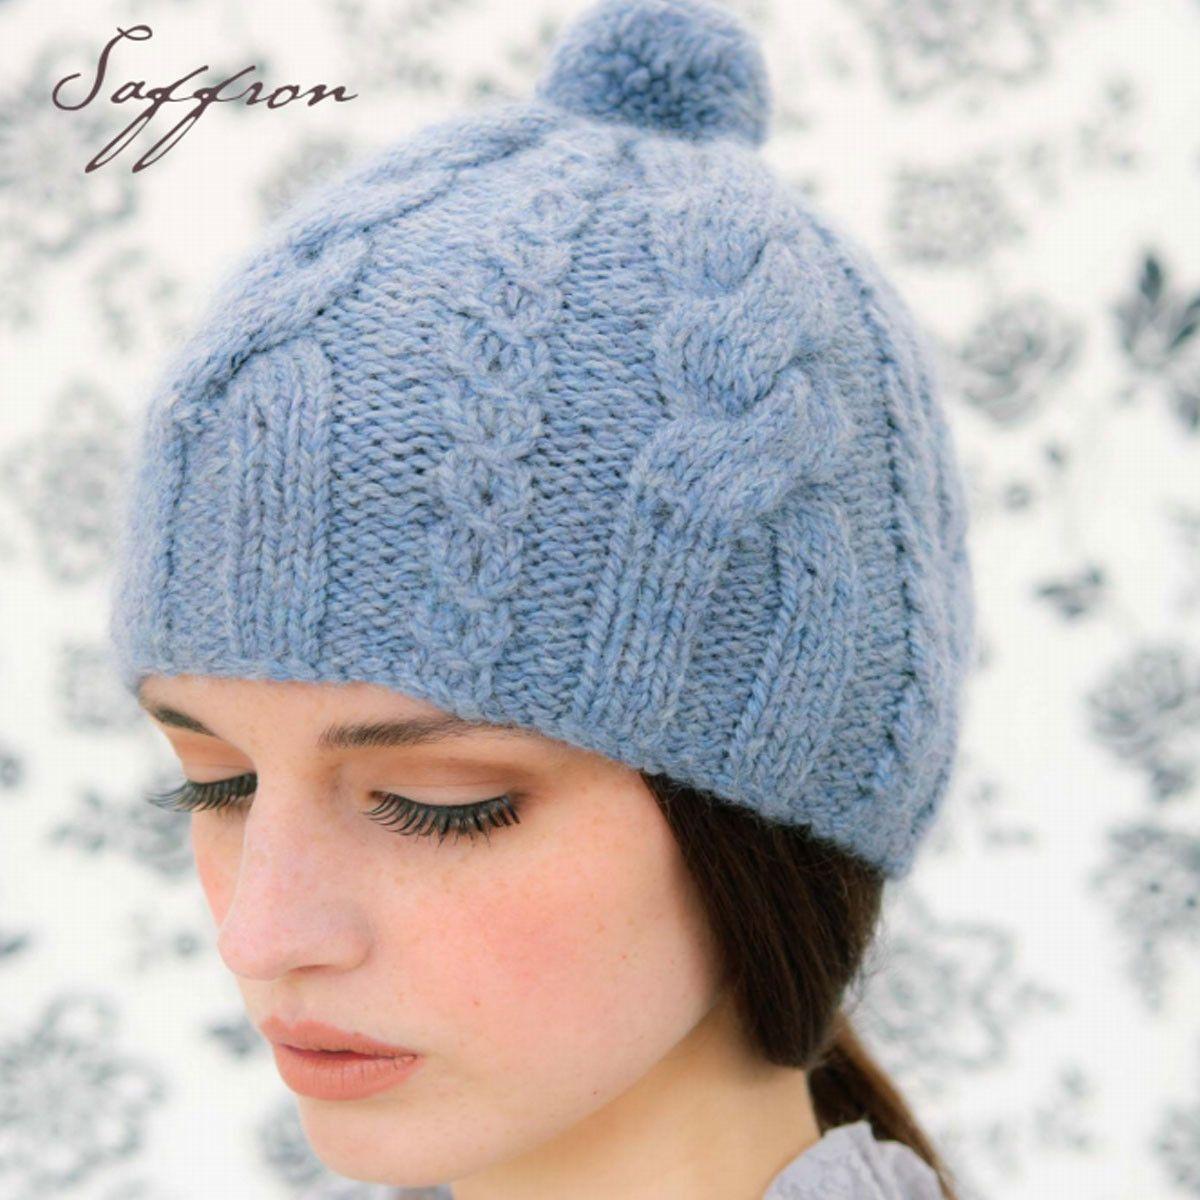 free beanie knitting pattern   Knitting to dp   Pinterest   Knitting ...